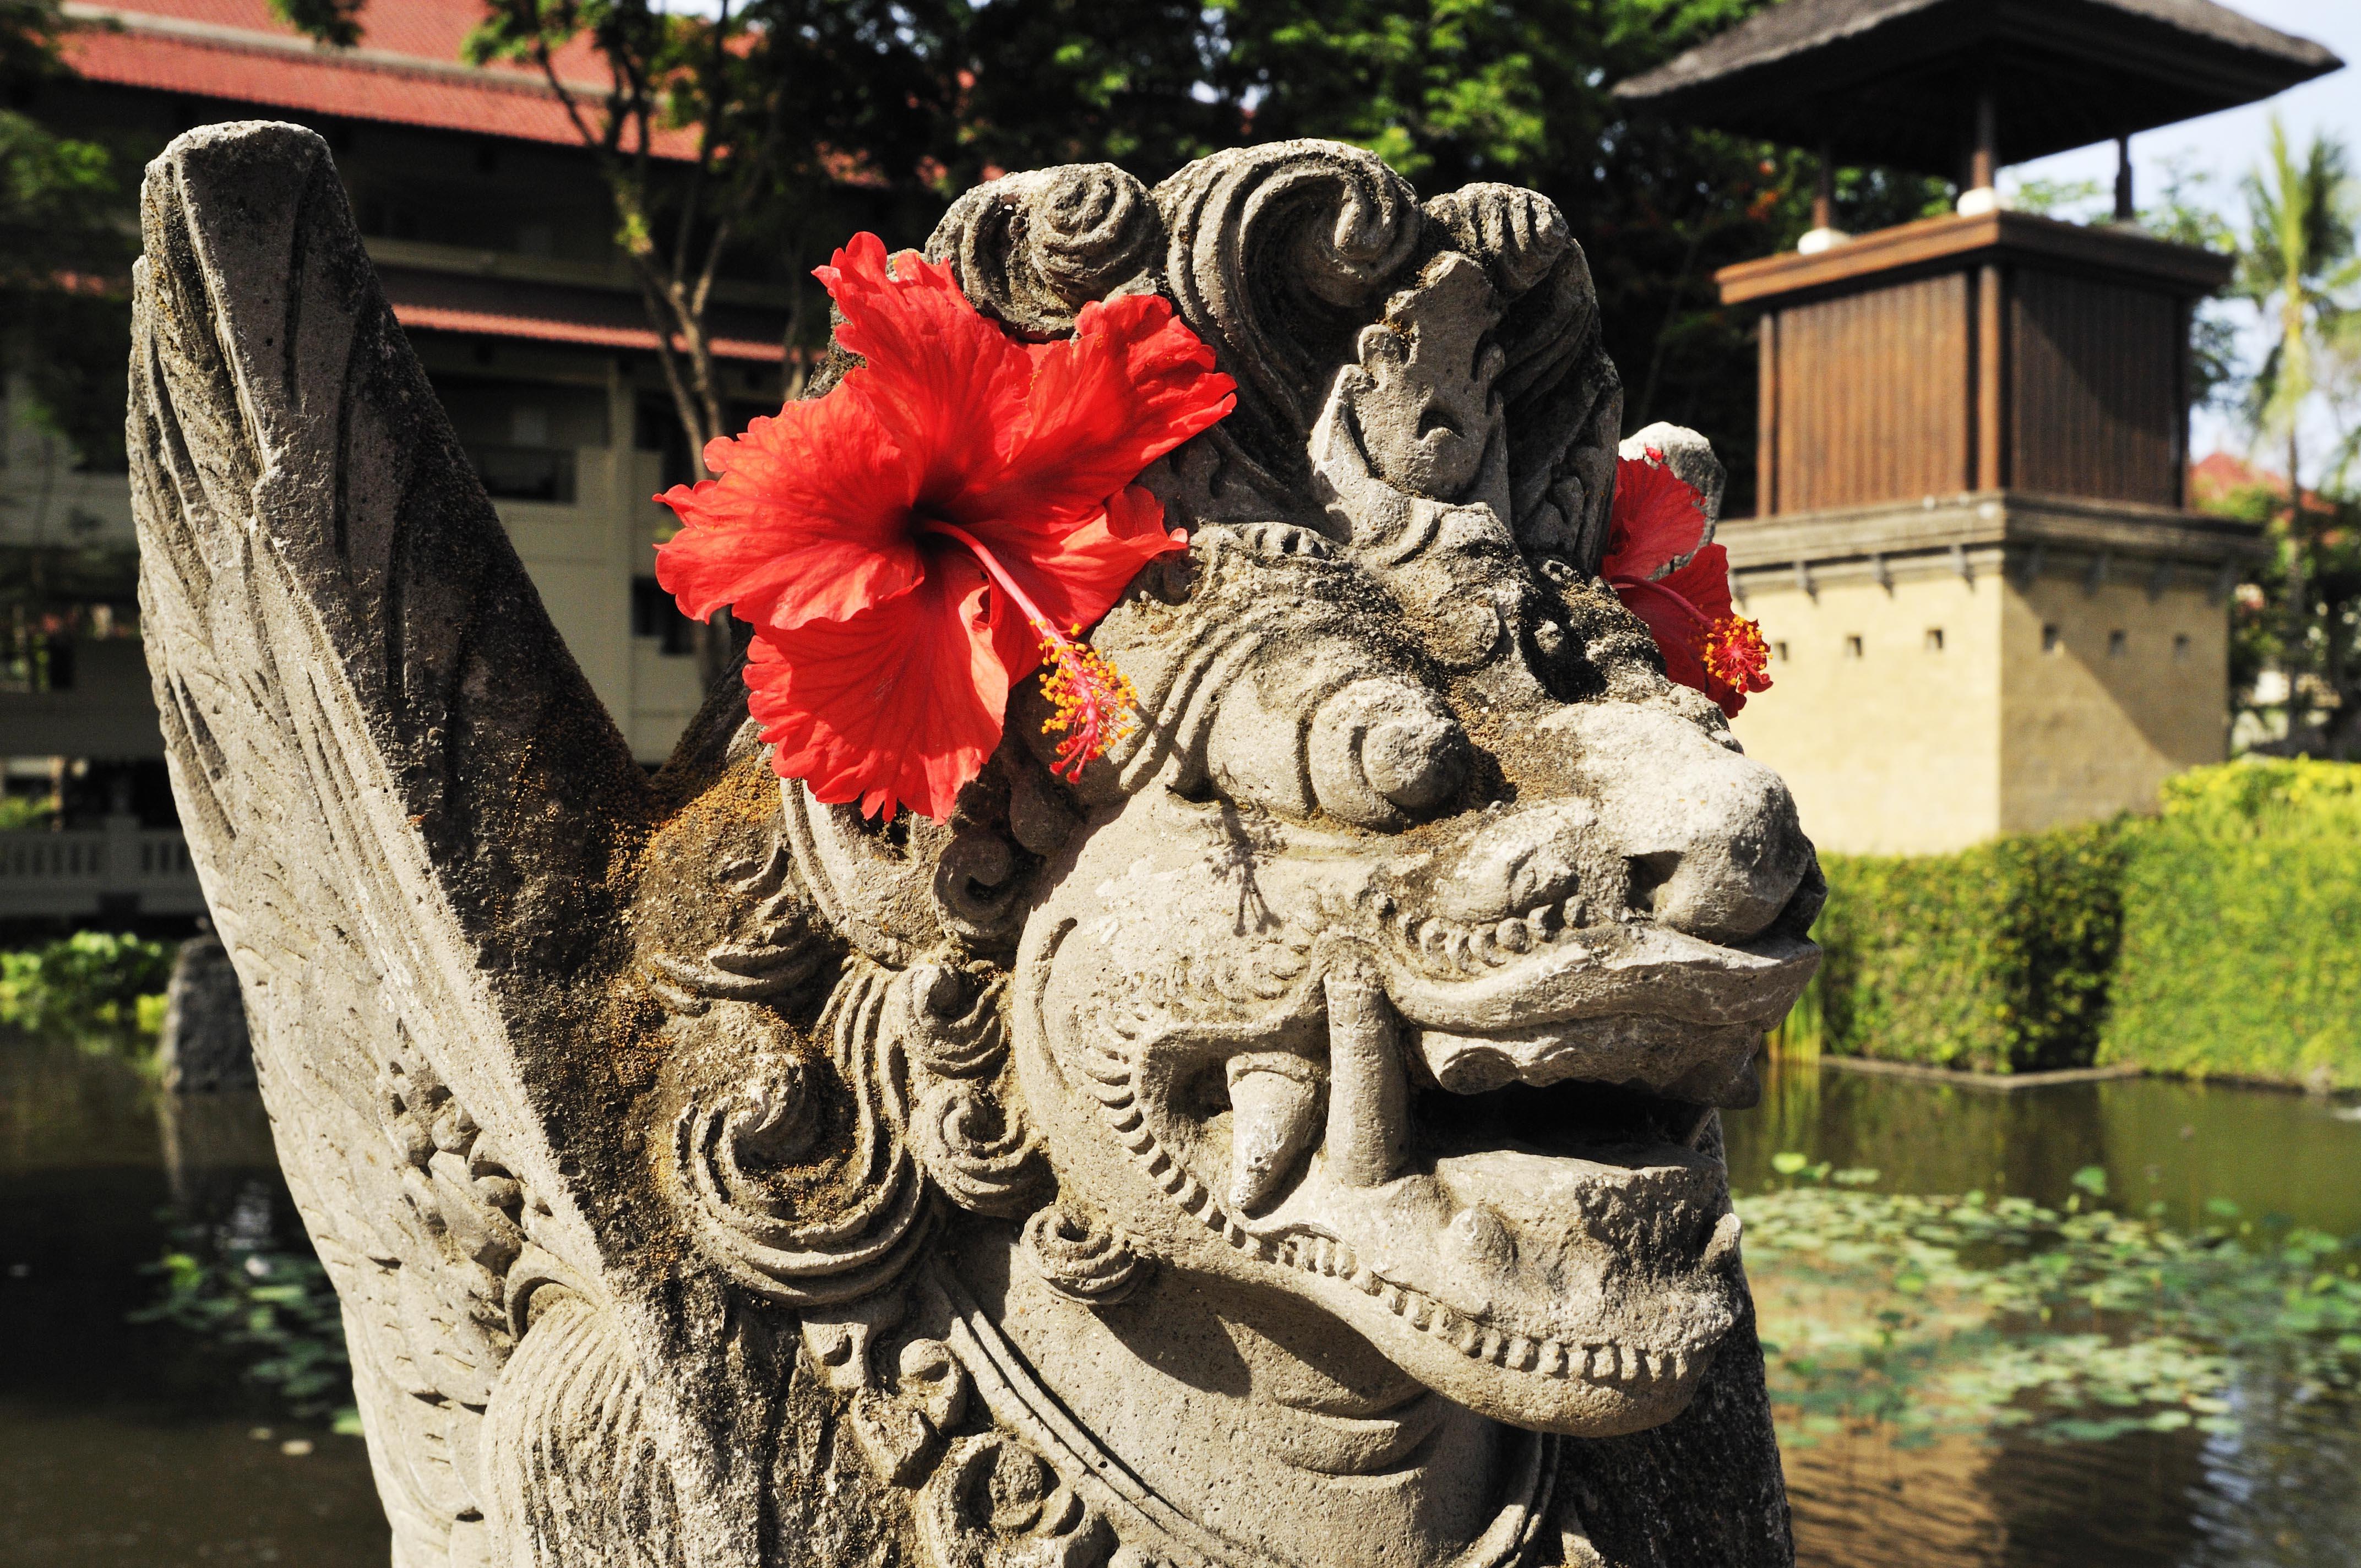 Balinese culture meets modern tourism